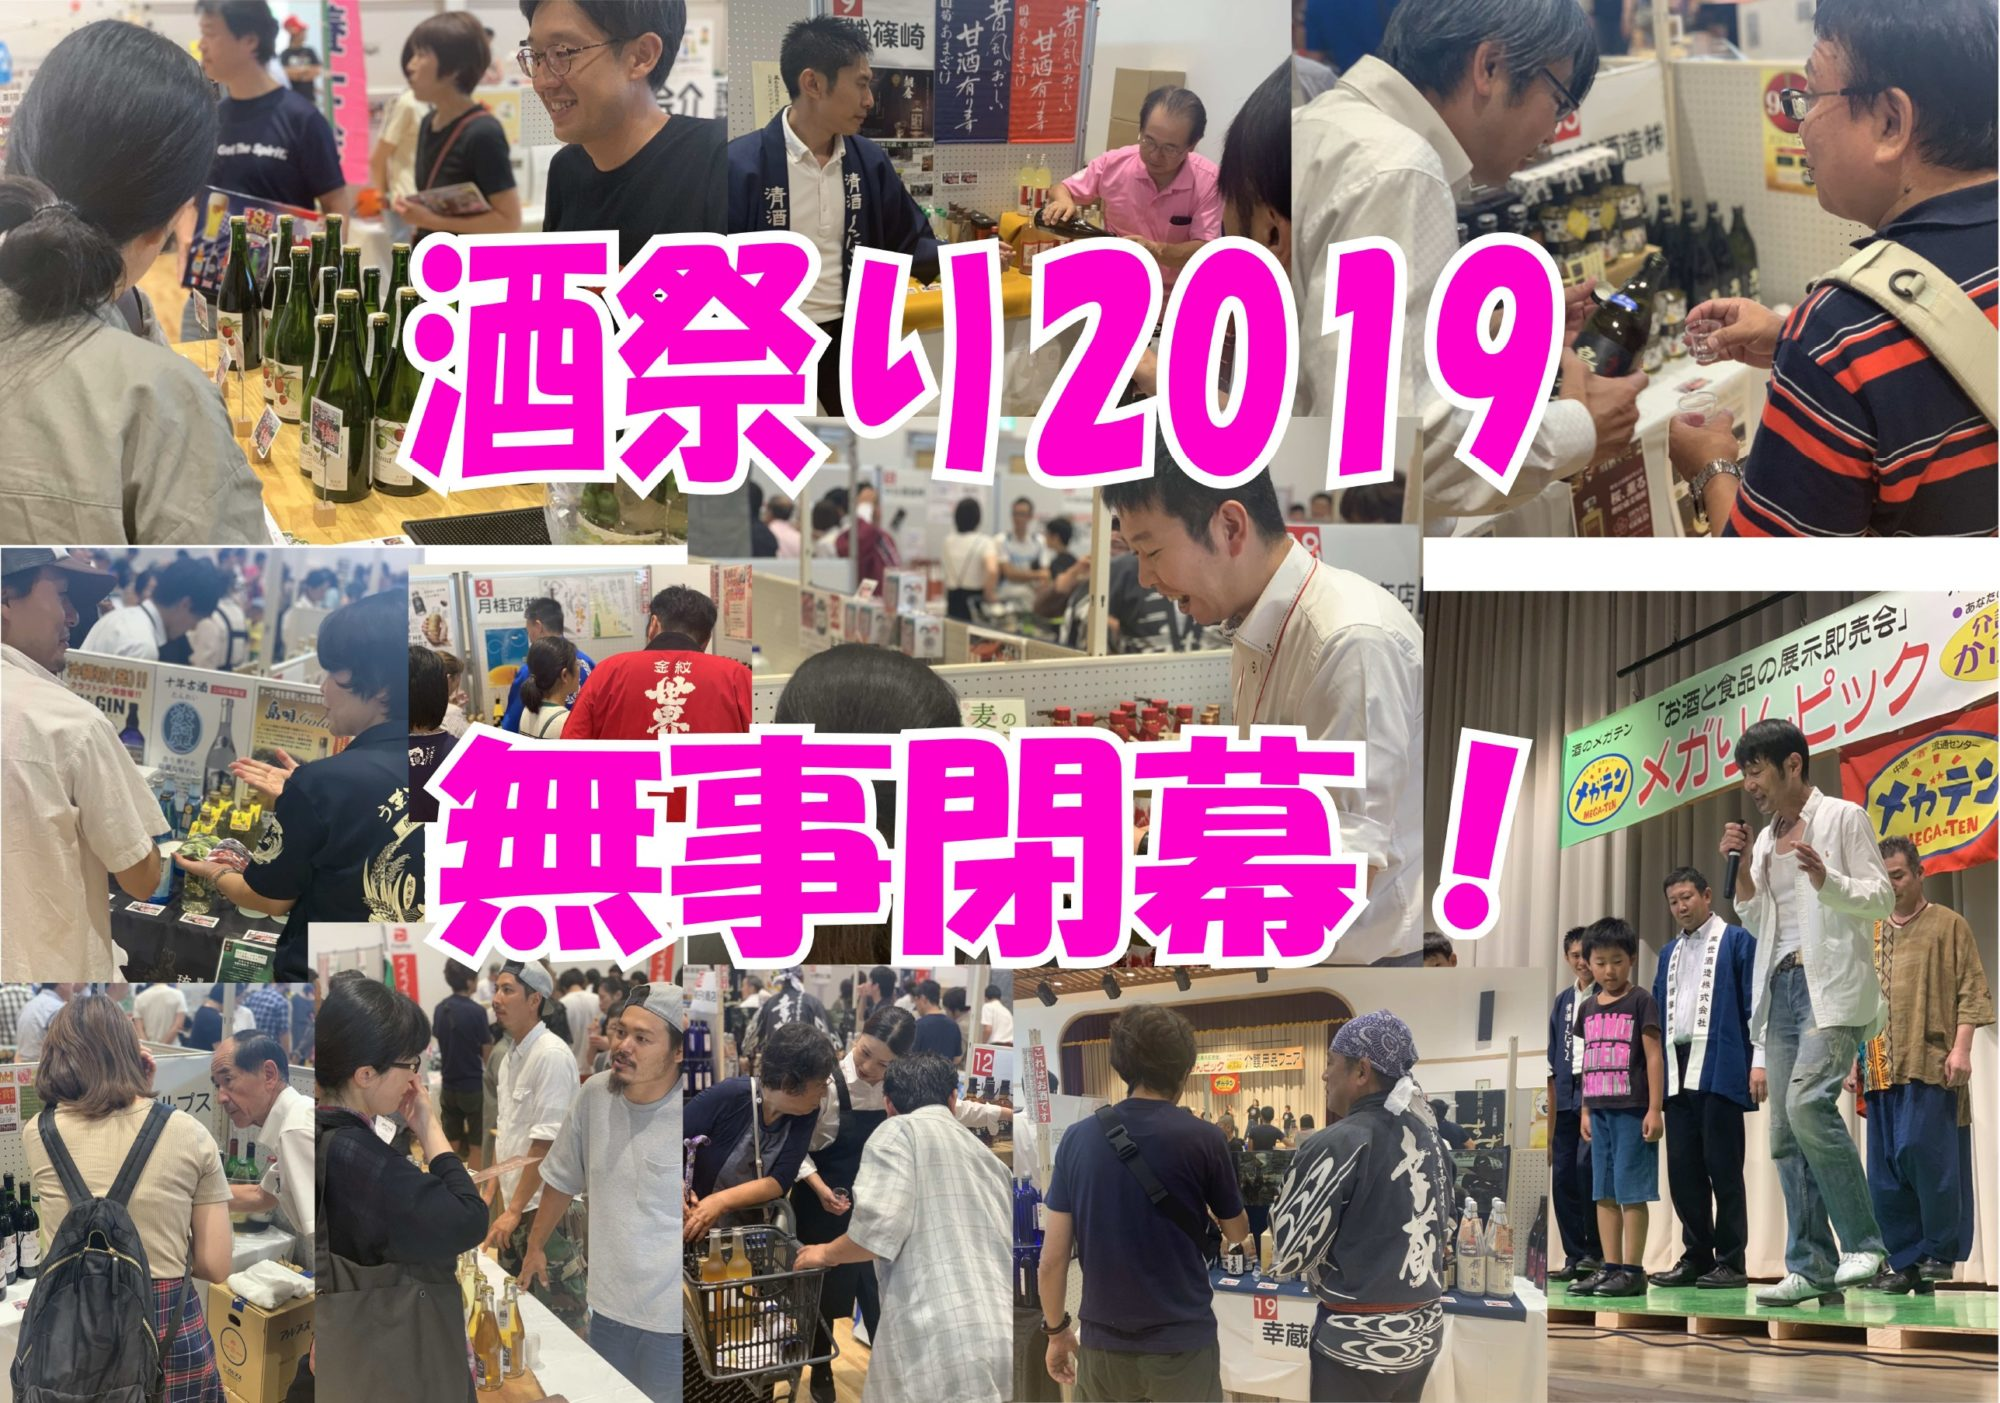 2019年9月14日~2019年9月15日 酒祭り無事閉幕!(1)